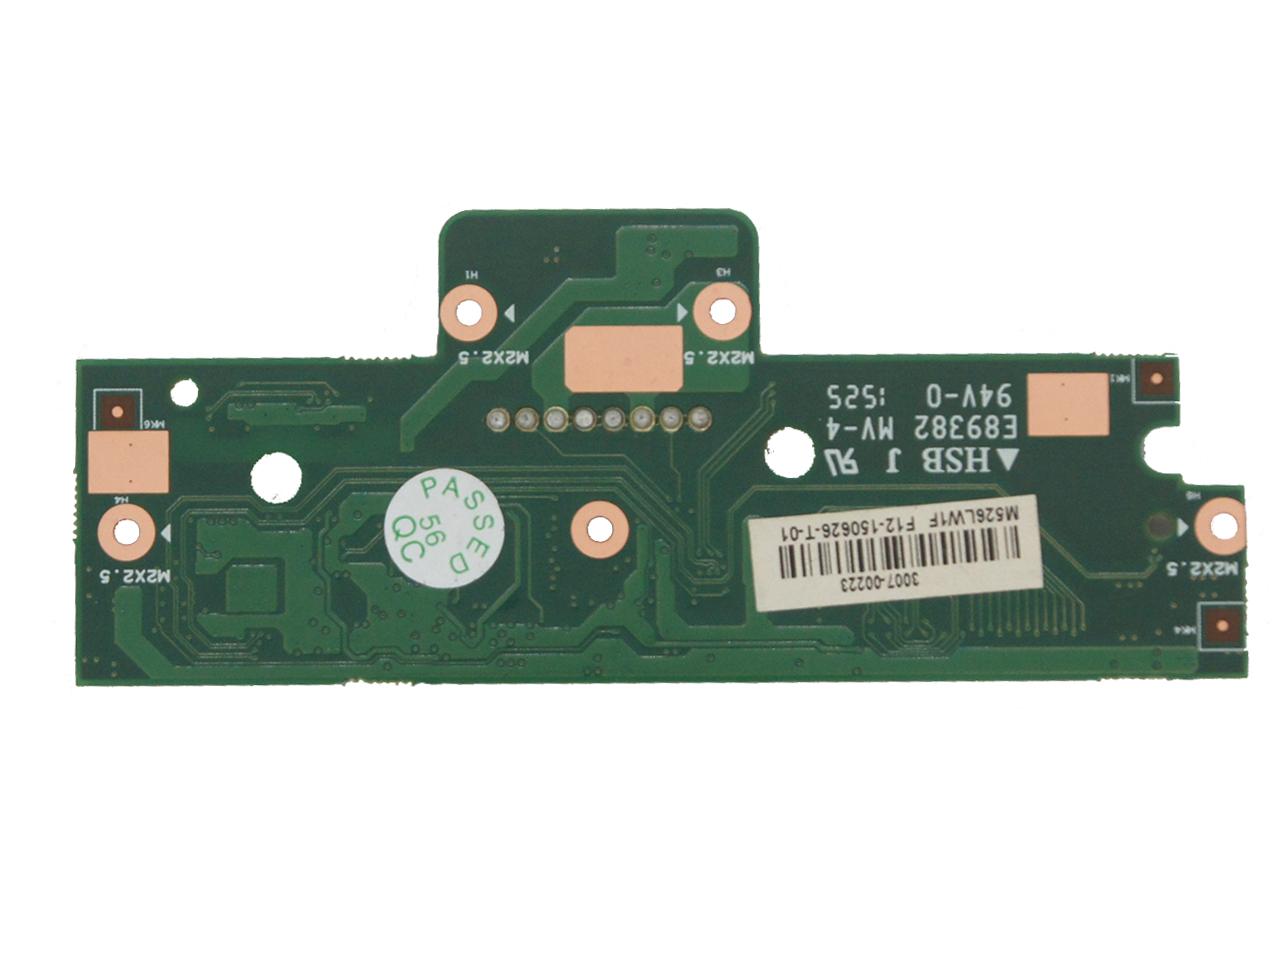 联想Lenovo miix 3-1030 磁吸底座键盘 接口小板 BH5418E V1.4 DOCK USB 8pin board